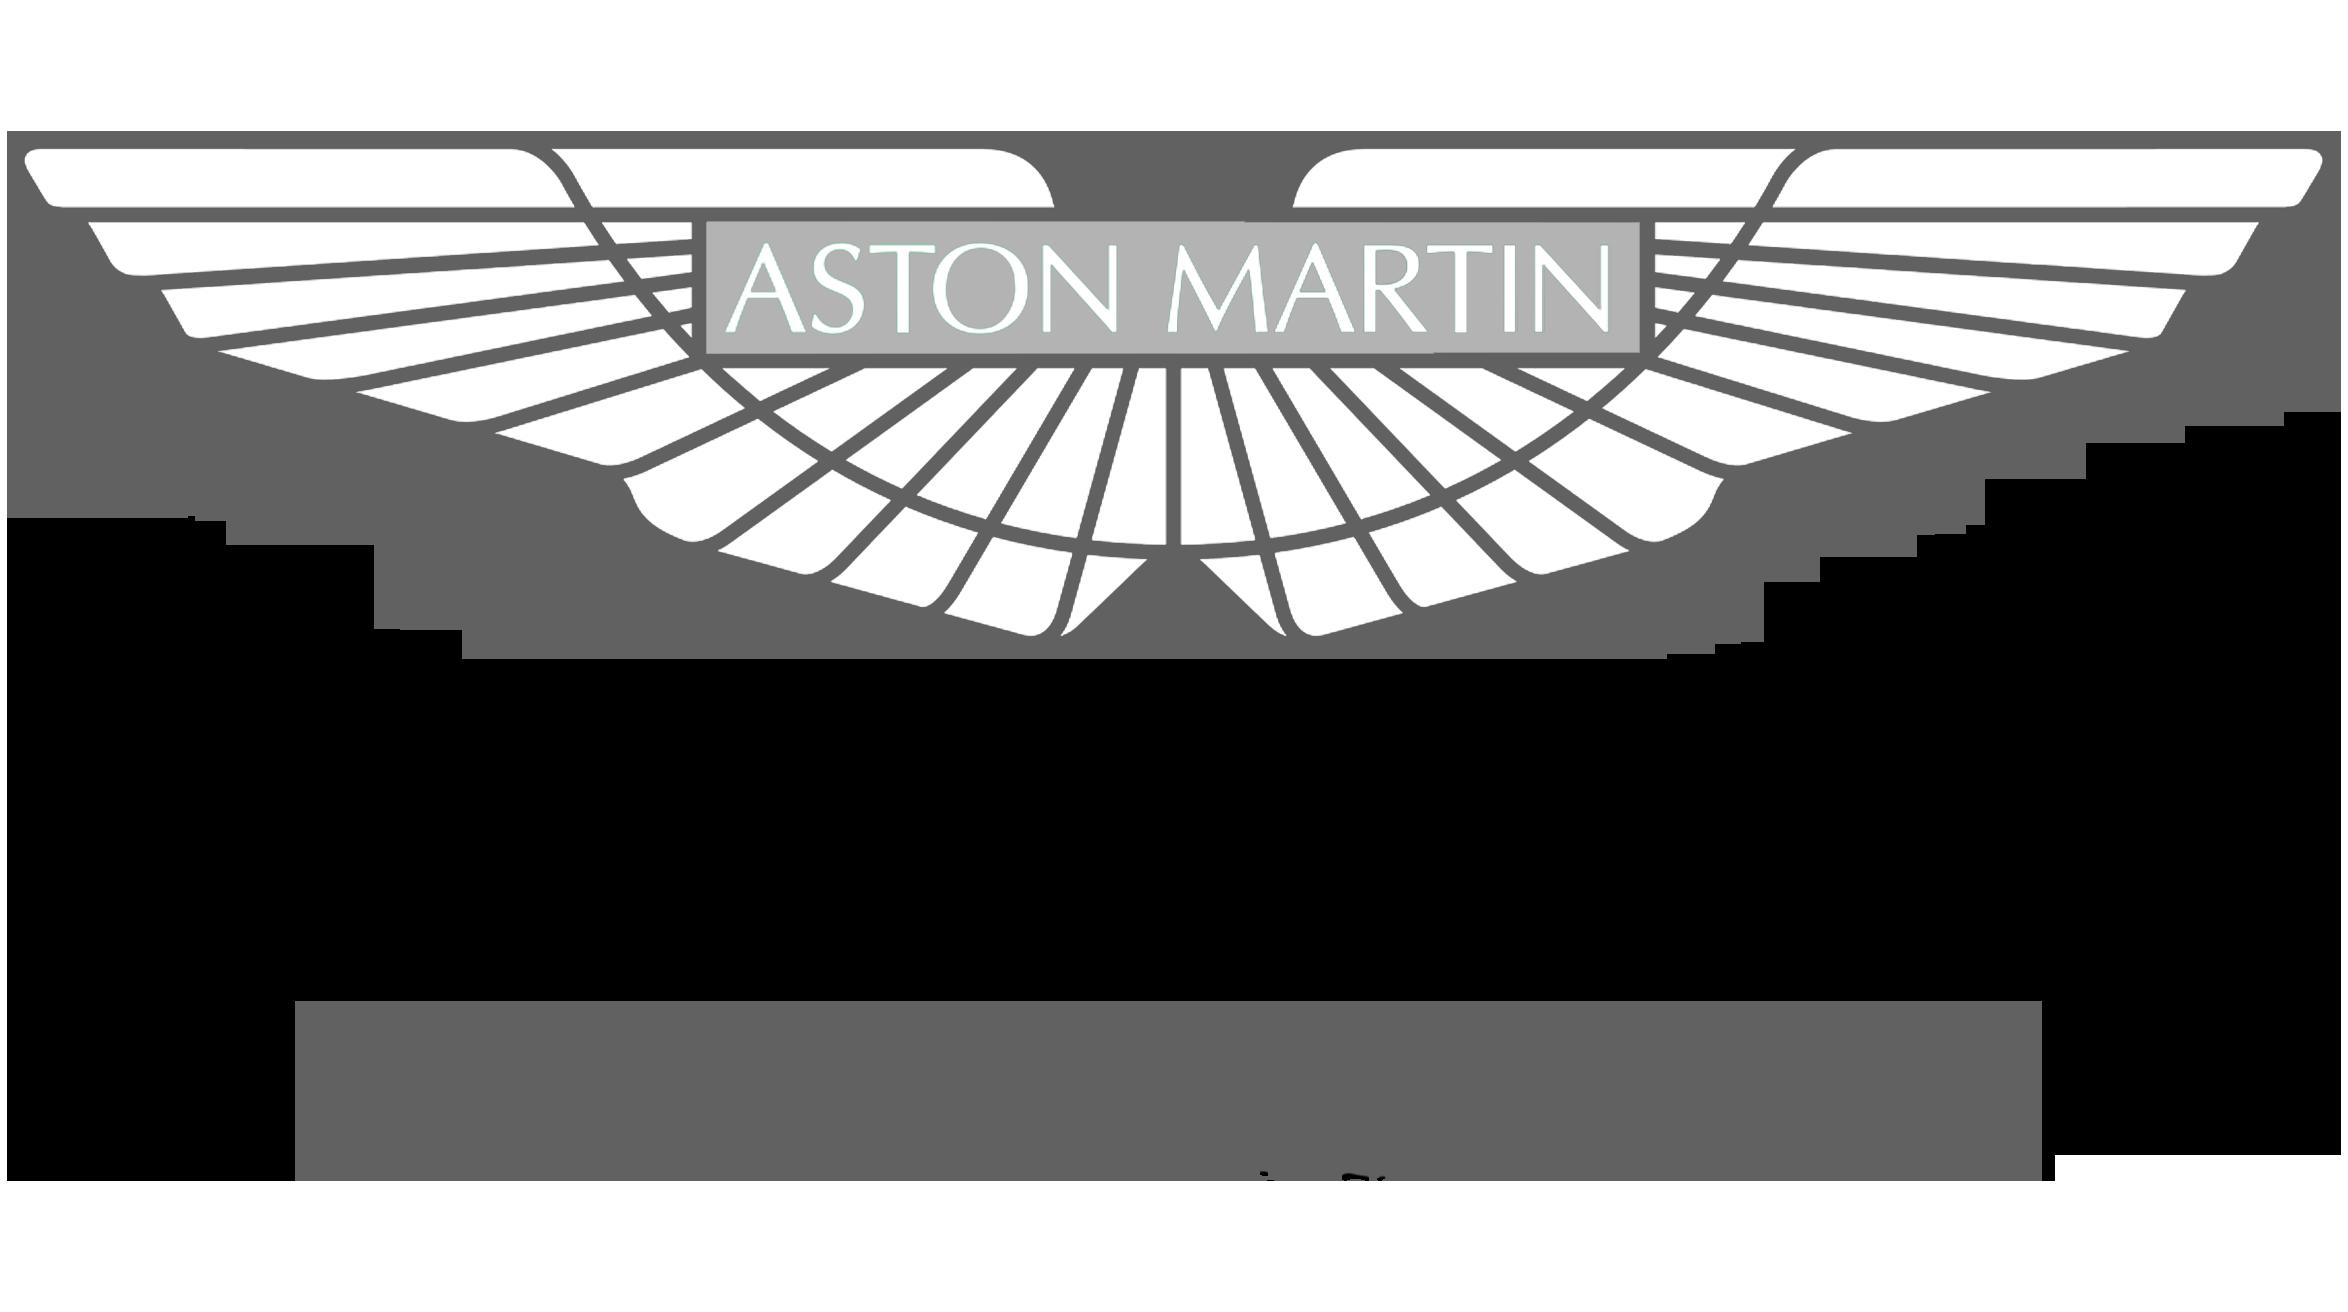 aston martinbn